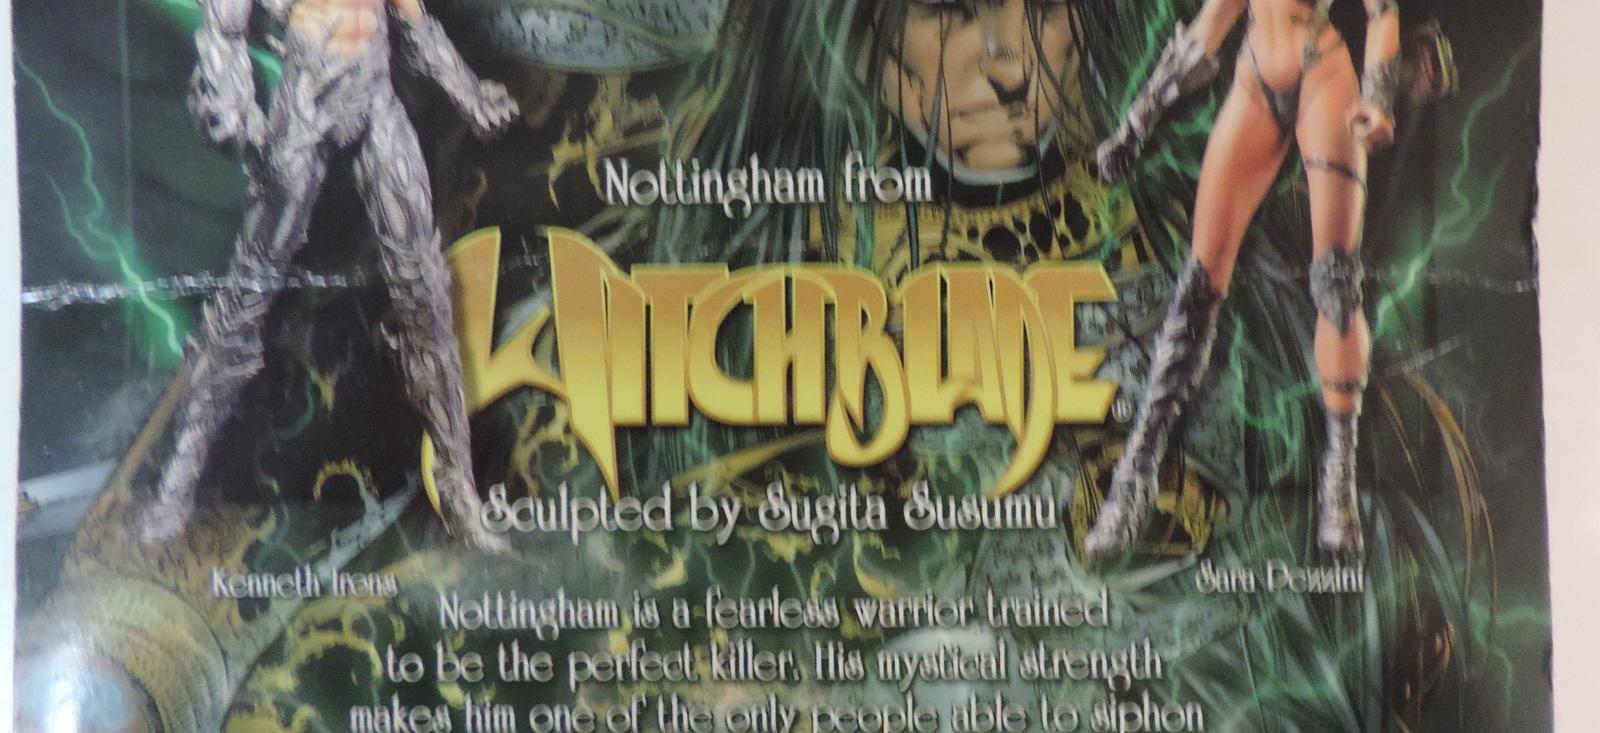 Top Cow Witchblade Ian Nottingham by Sugita Susumu  - New